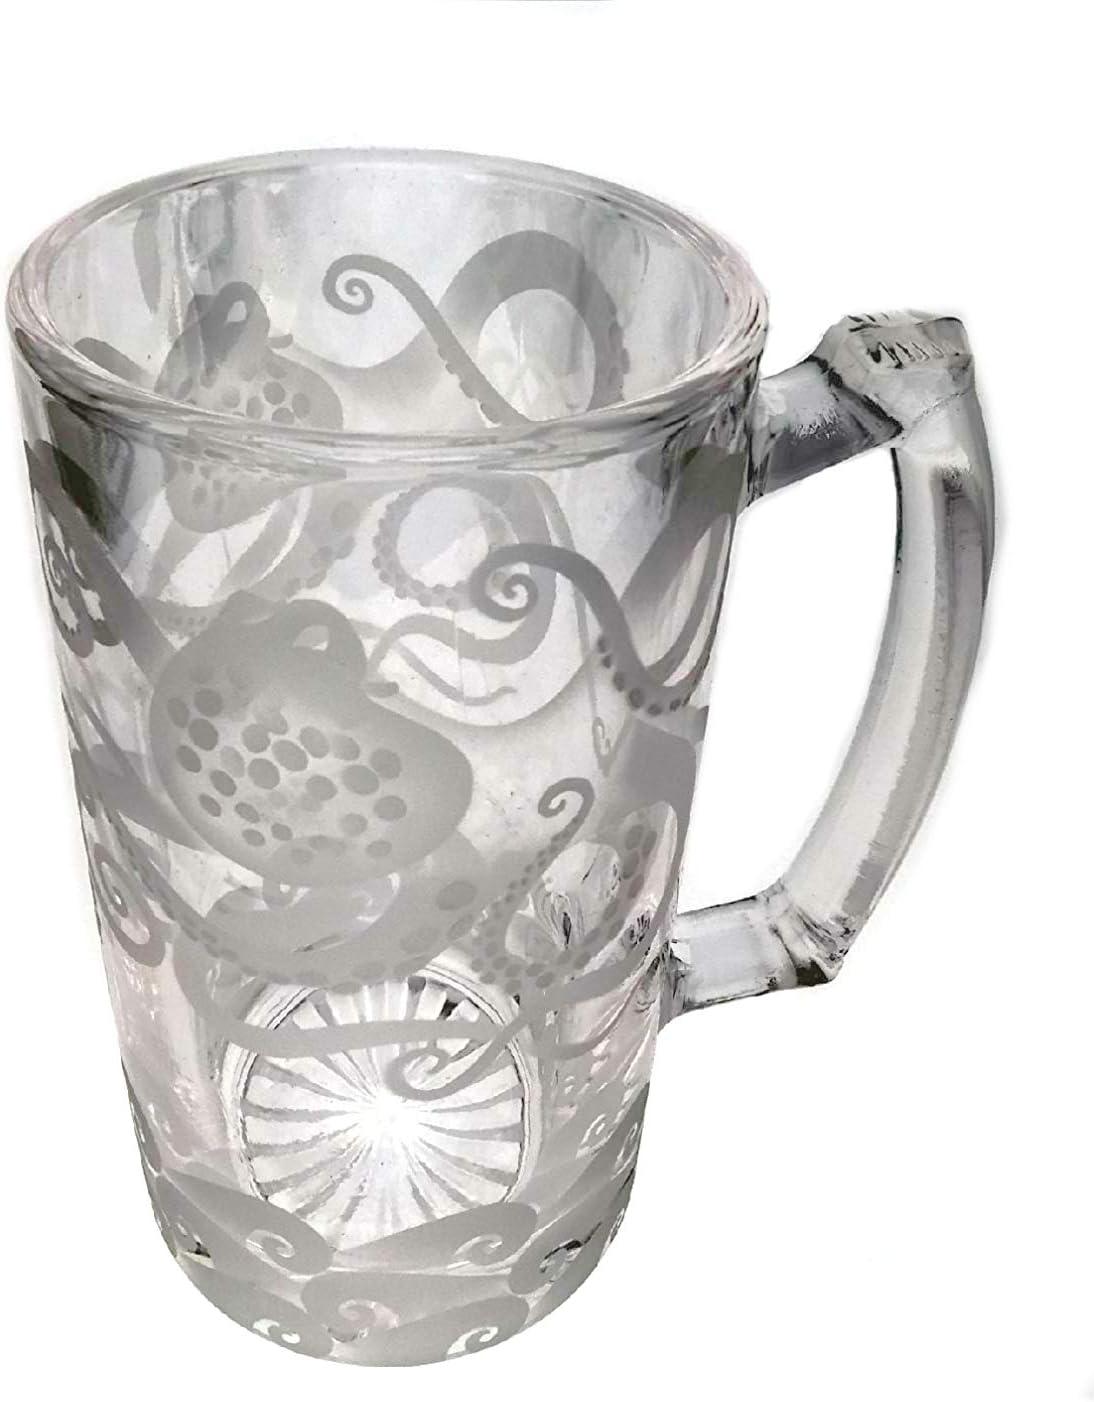 IncisoArt Hand Etched Glass Coffee Mug Permanent Sandblasted Sand Carve Engraved